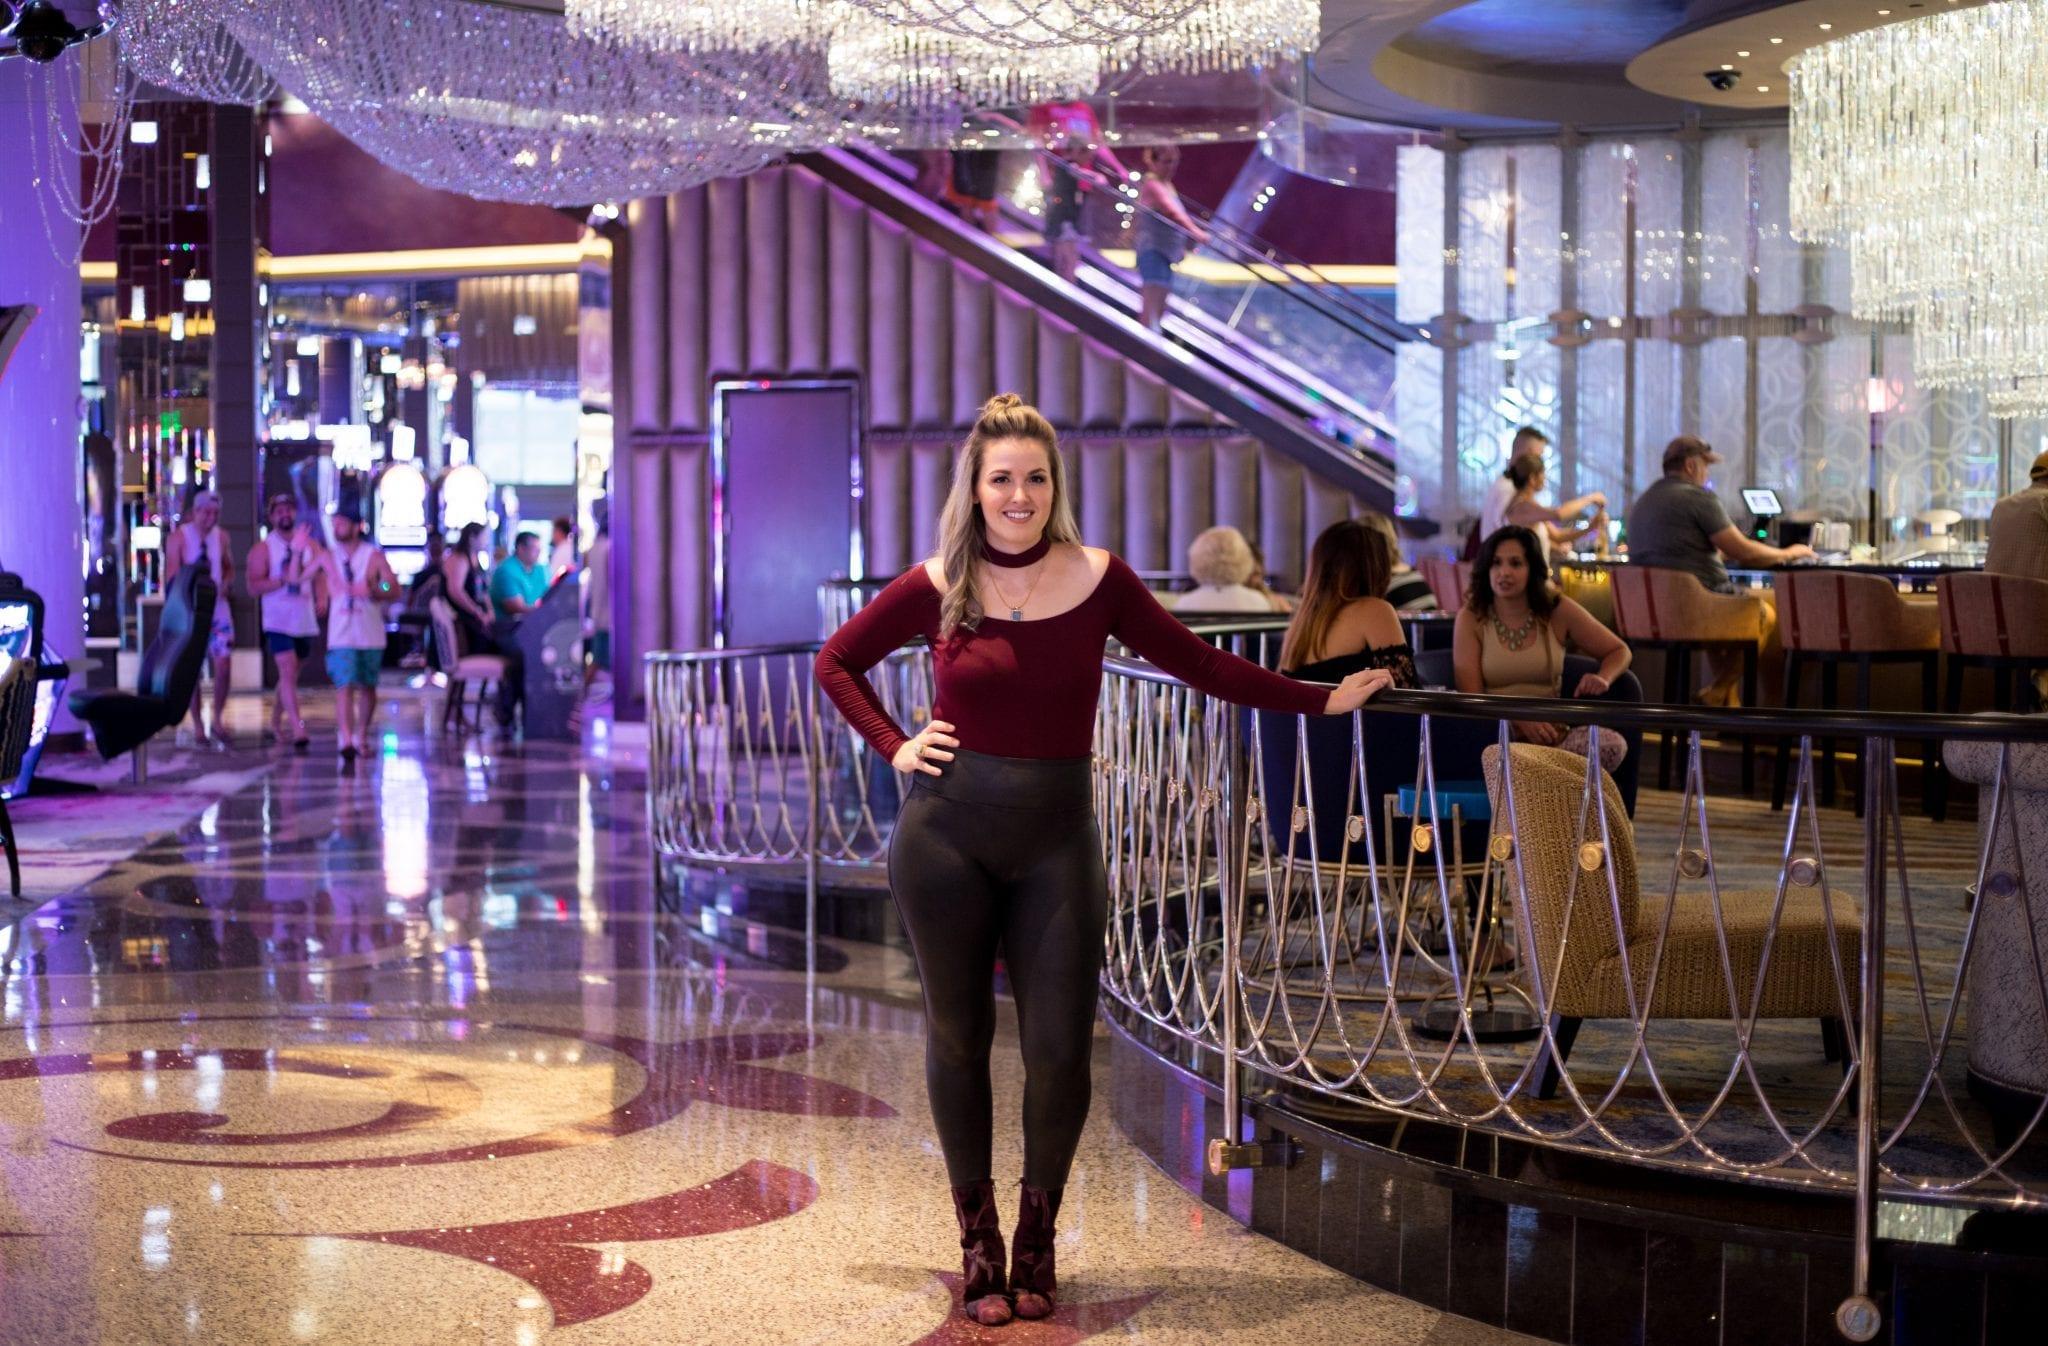 vegas outfit ideas | vegas trip planning | vegas trip outfits | tips for first time in vegas | Vegas outfit ideas summer | meghna jewels | tobi choker crop top | never skip brunch | cara newhart - denver style blogger